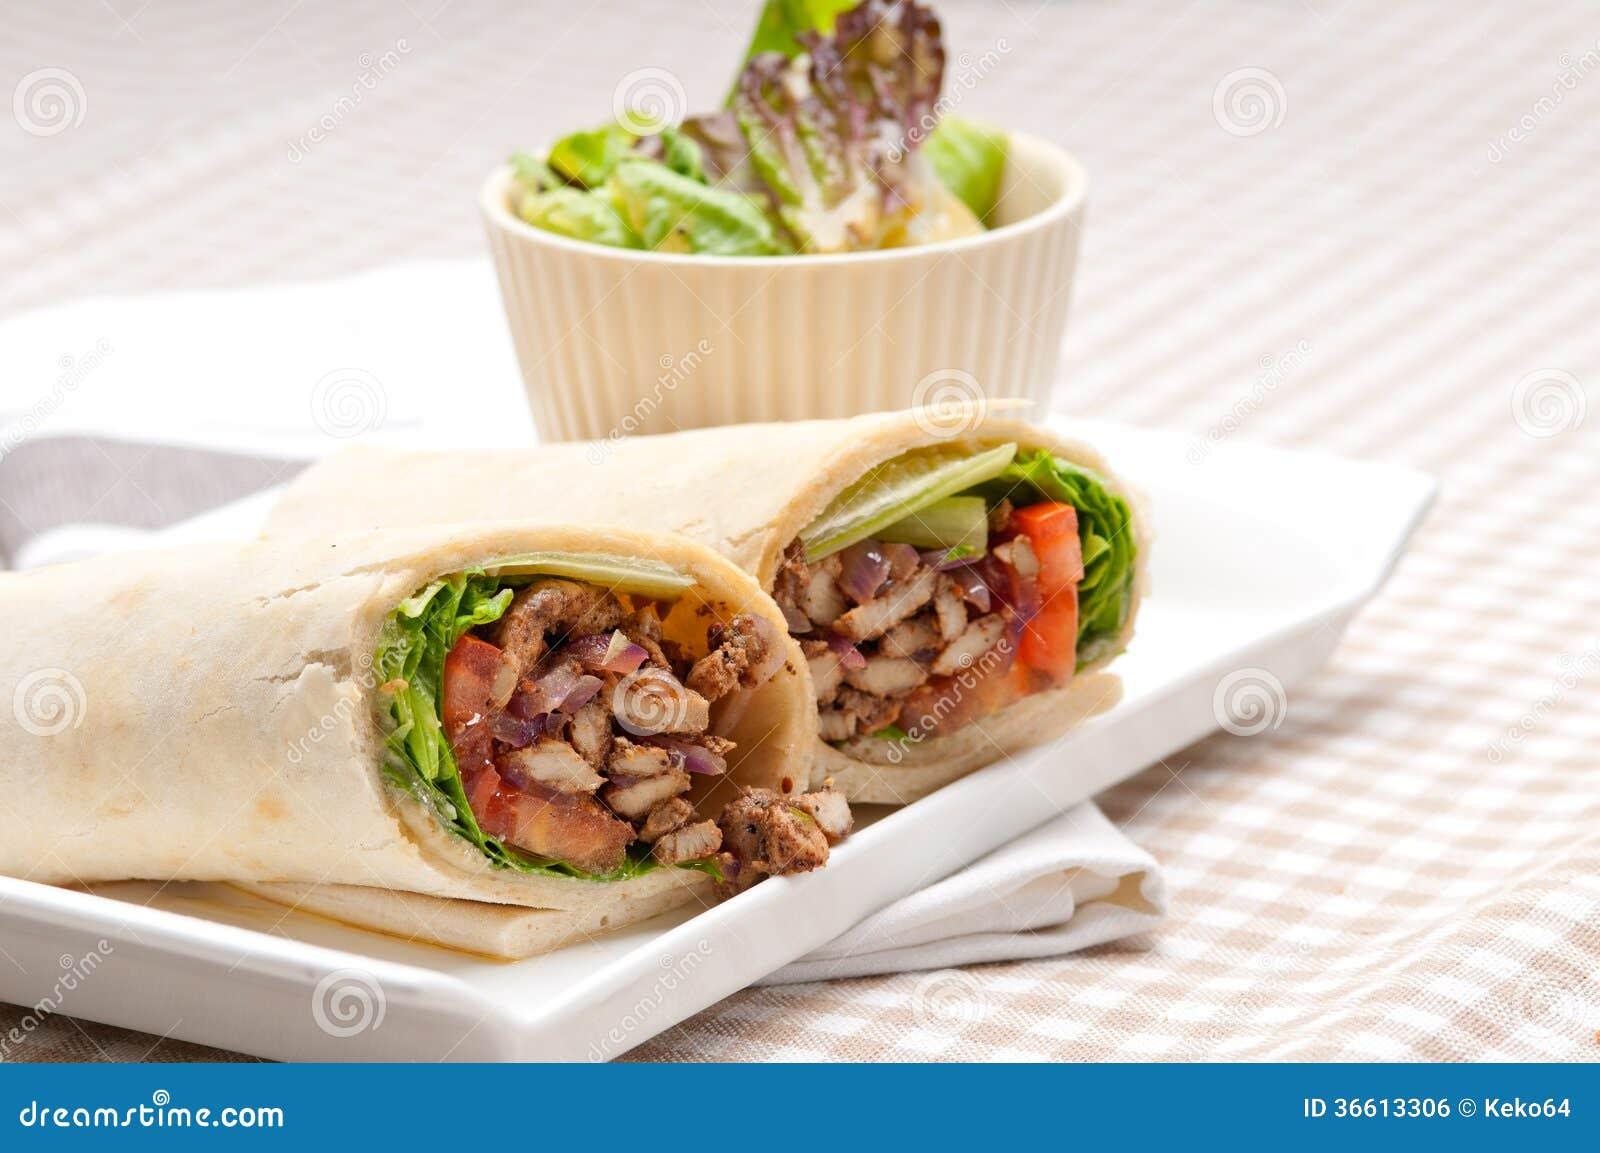 Chicken shawarma roll - photo#18